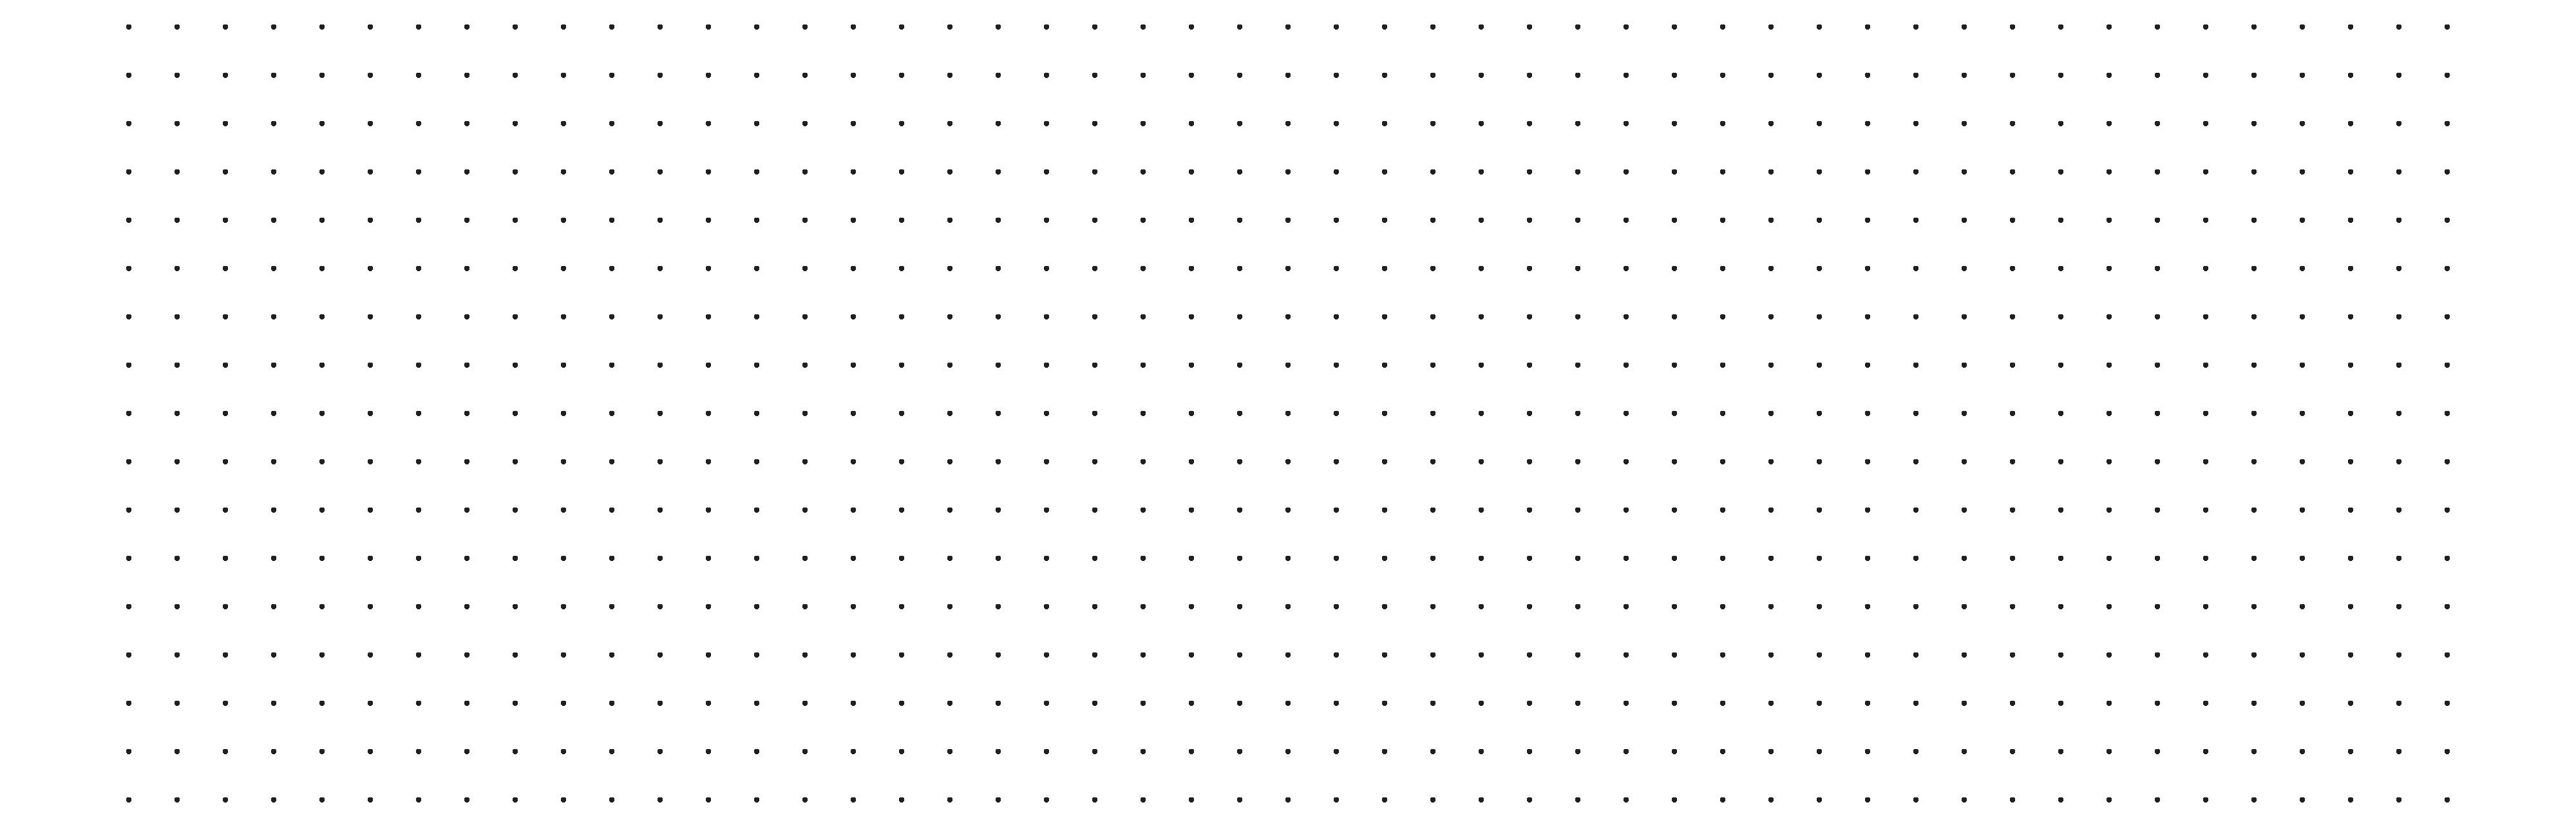 Pattern-01